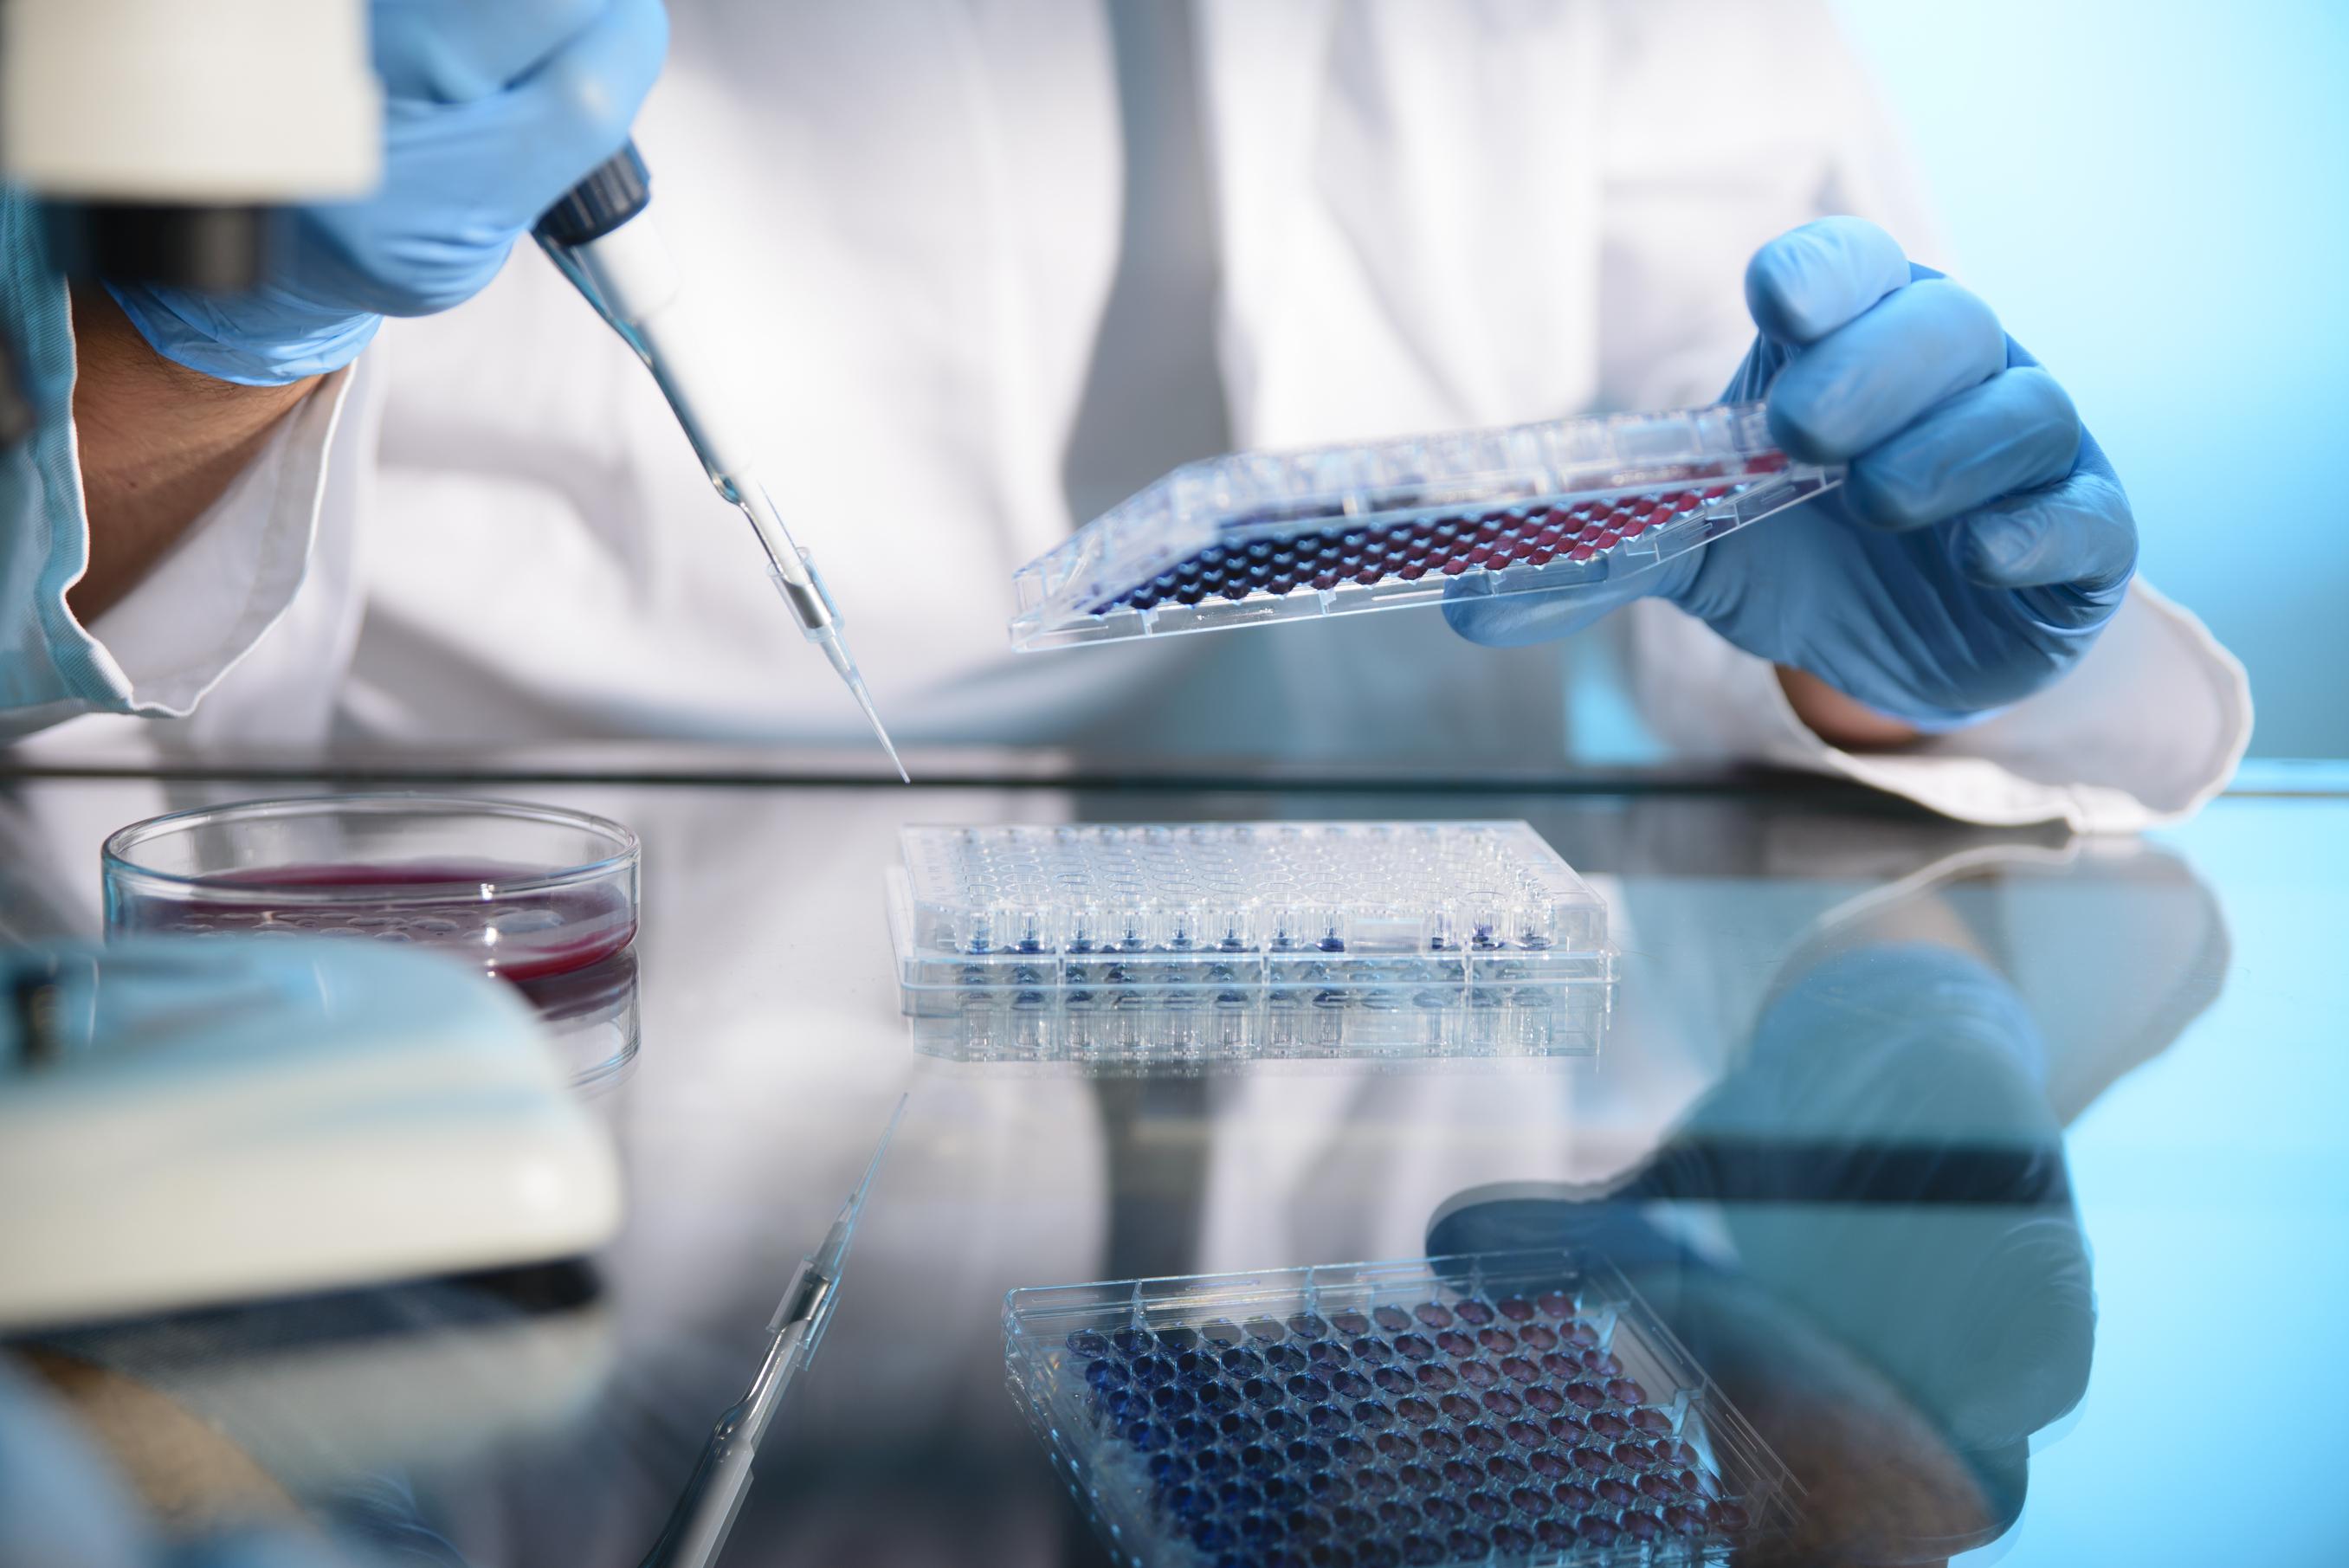 Scientific Experiment medicina tecnologia